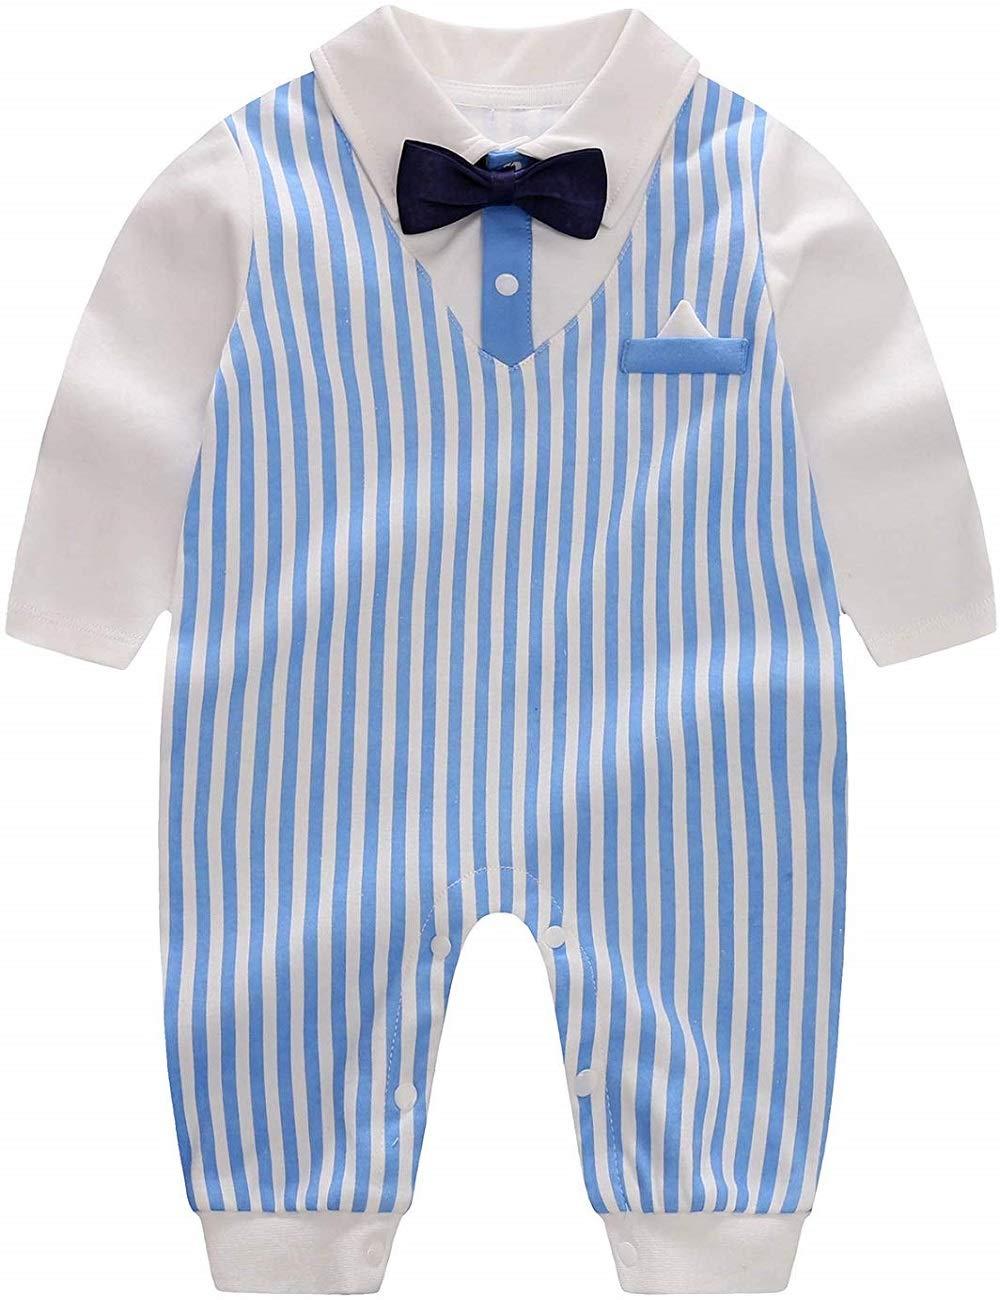 Yoveme Newborn Baby Boy Gentleman Clothes,Infant Bow Ties Tuxedo Romper Formal Outfits